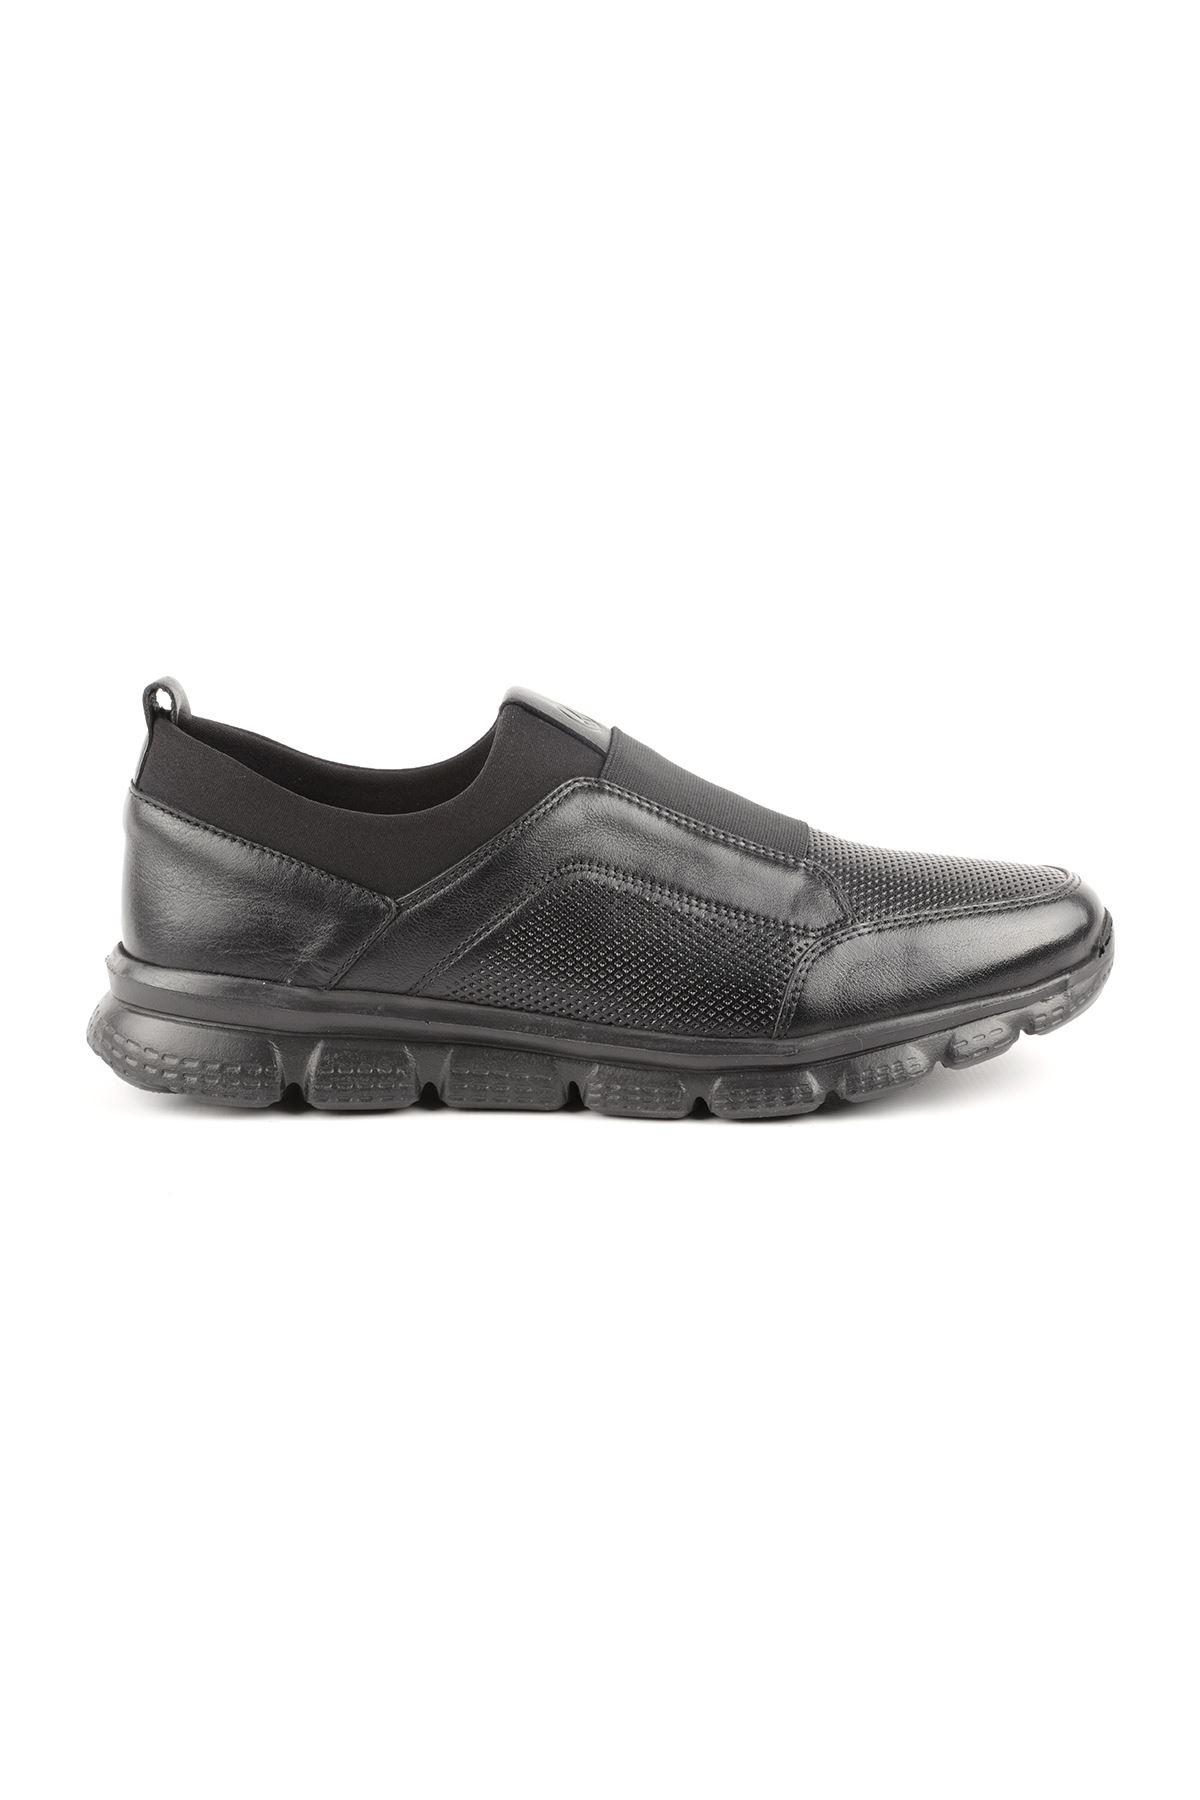 Libero L3625 Black Men's Sport Shoes